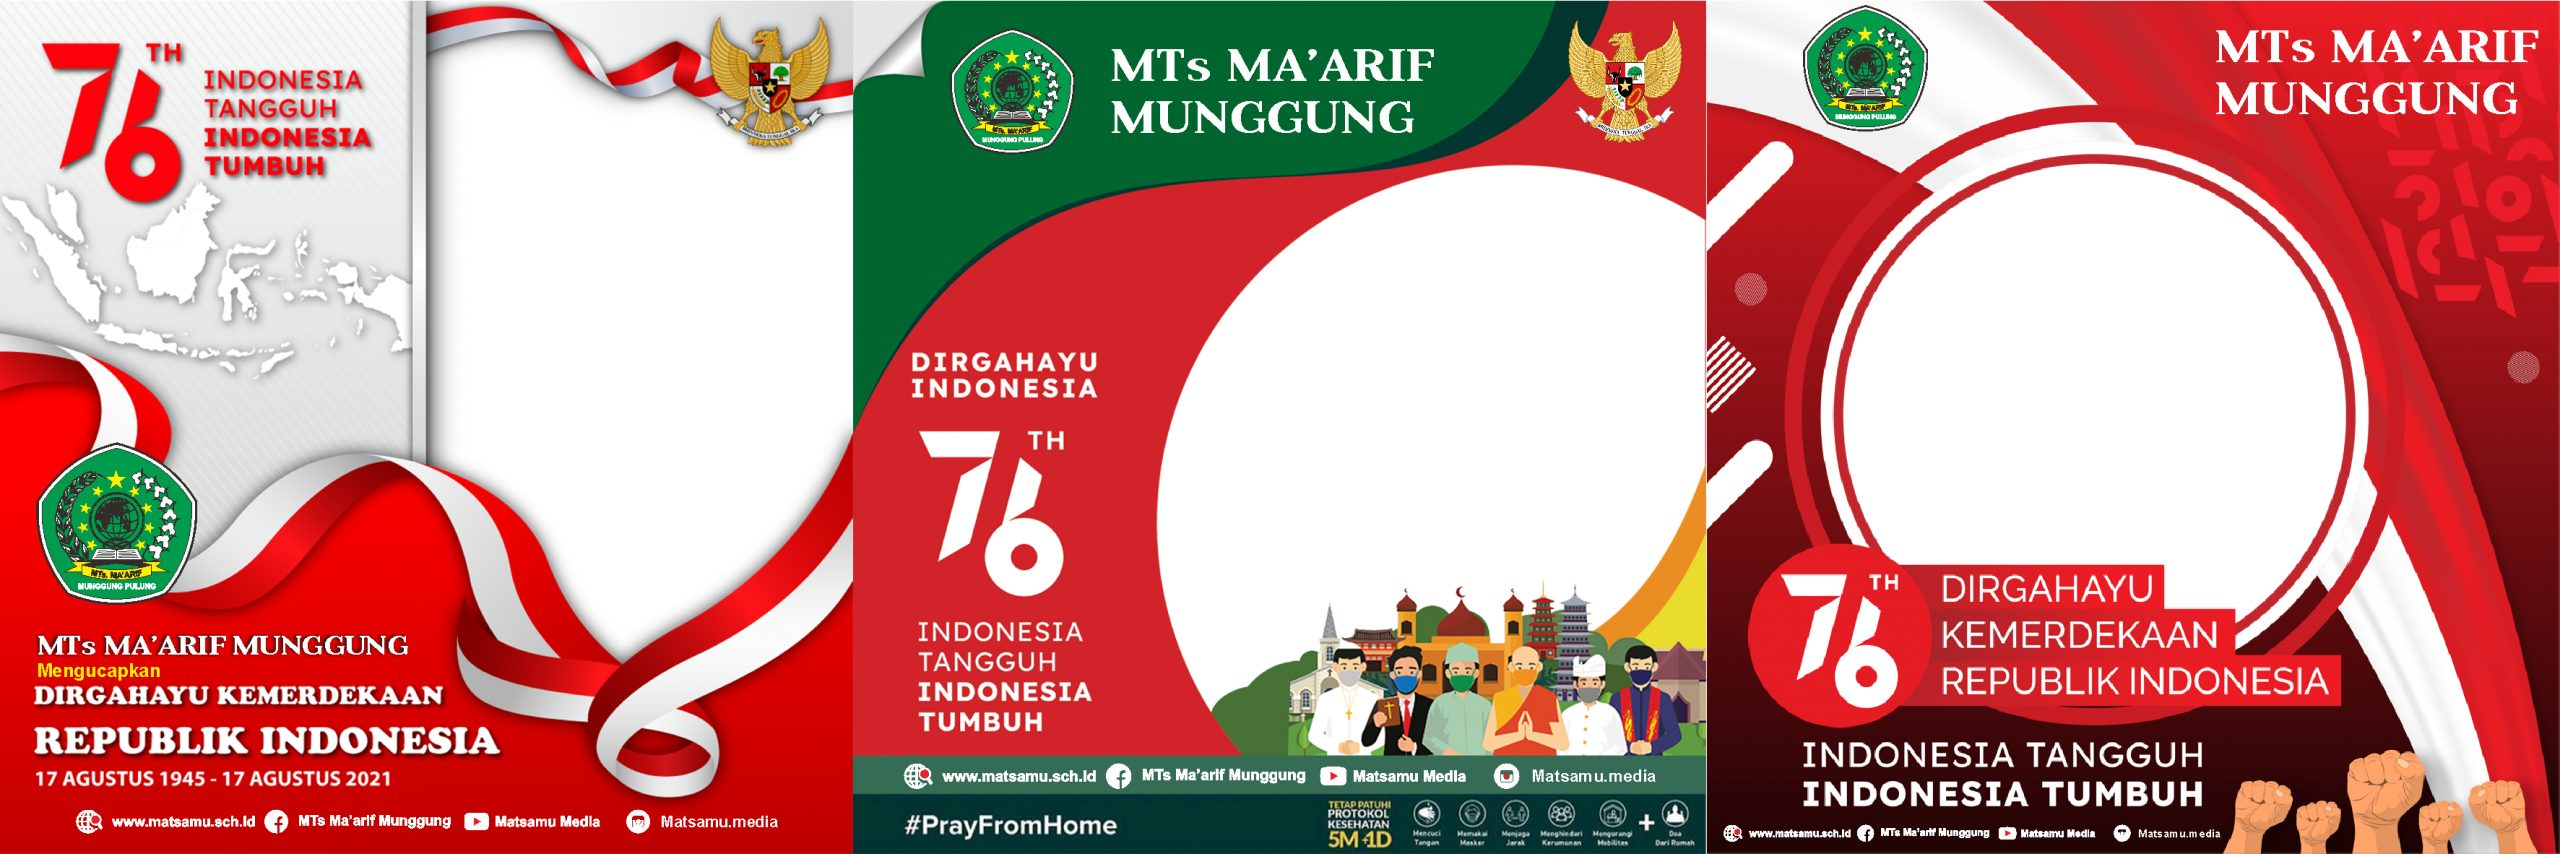 TWIBBON DIRGAHAYU INDONESIA KE-76